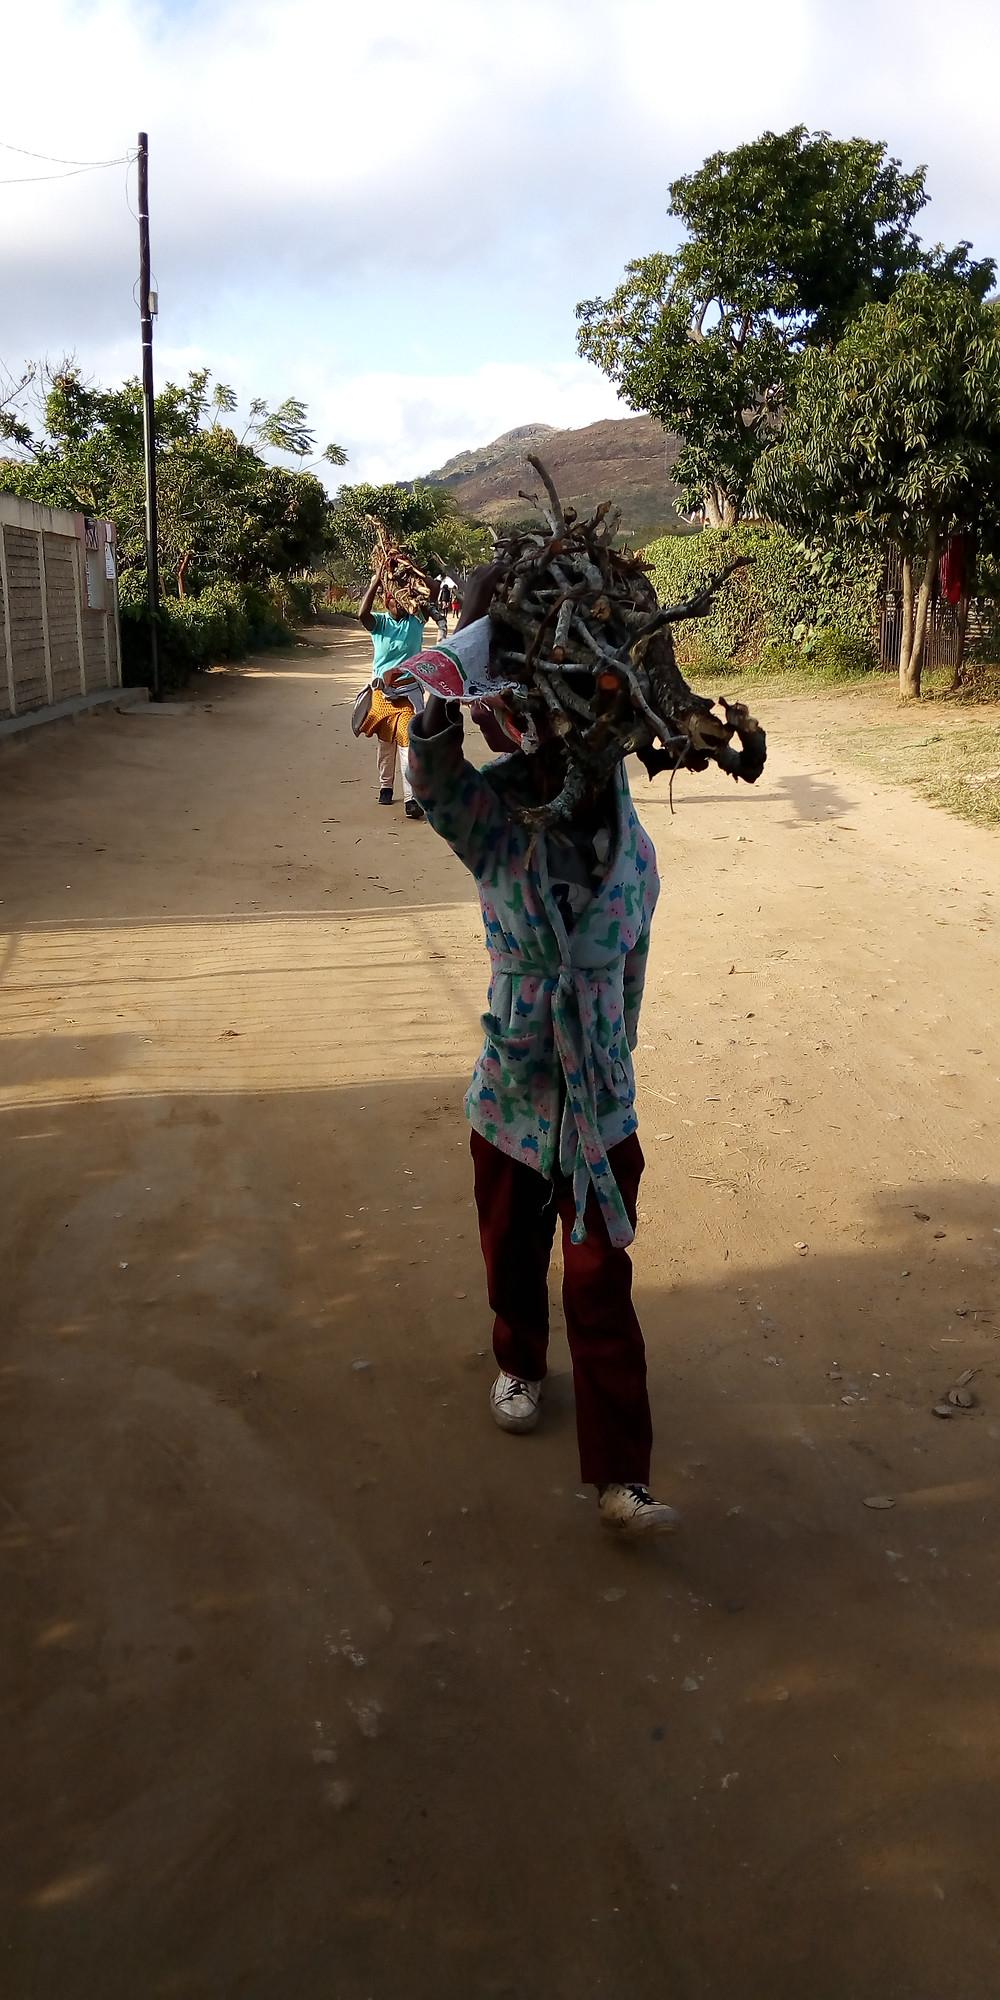 Zimbabwean children and women fetching firewood